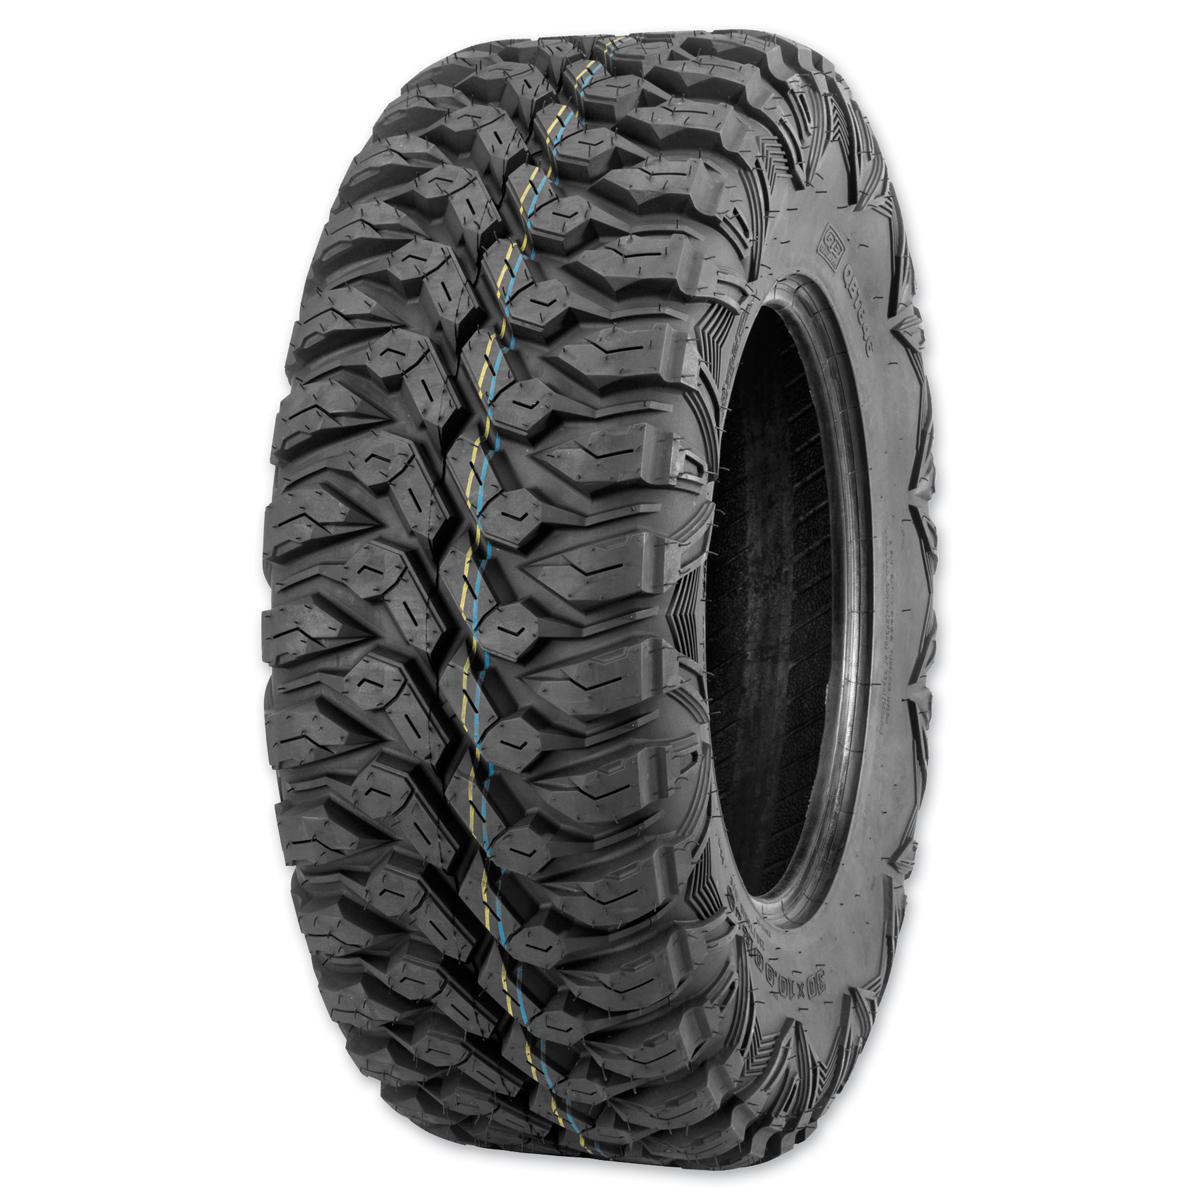 Quadboss QBT846 32X10R-15 8-Ply Front/Rear Tire